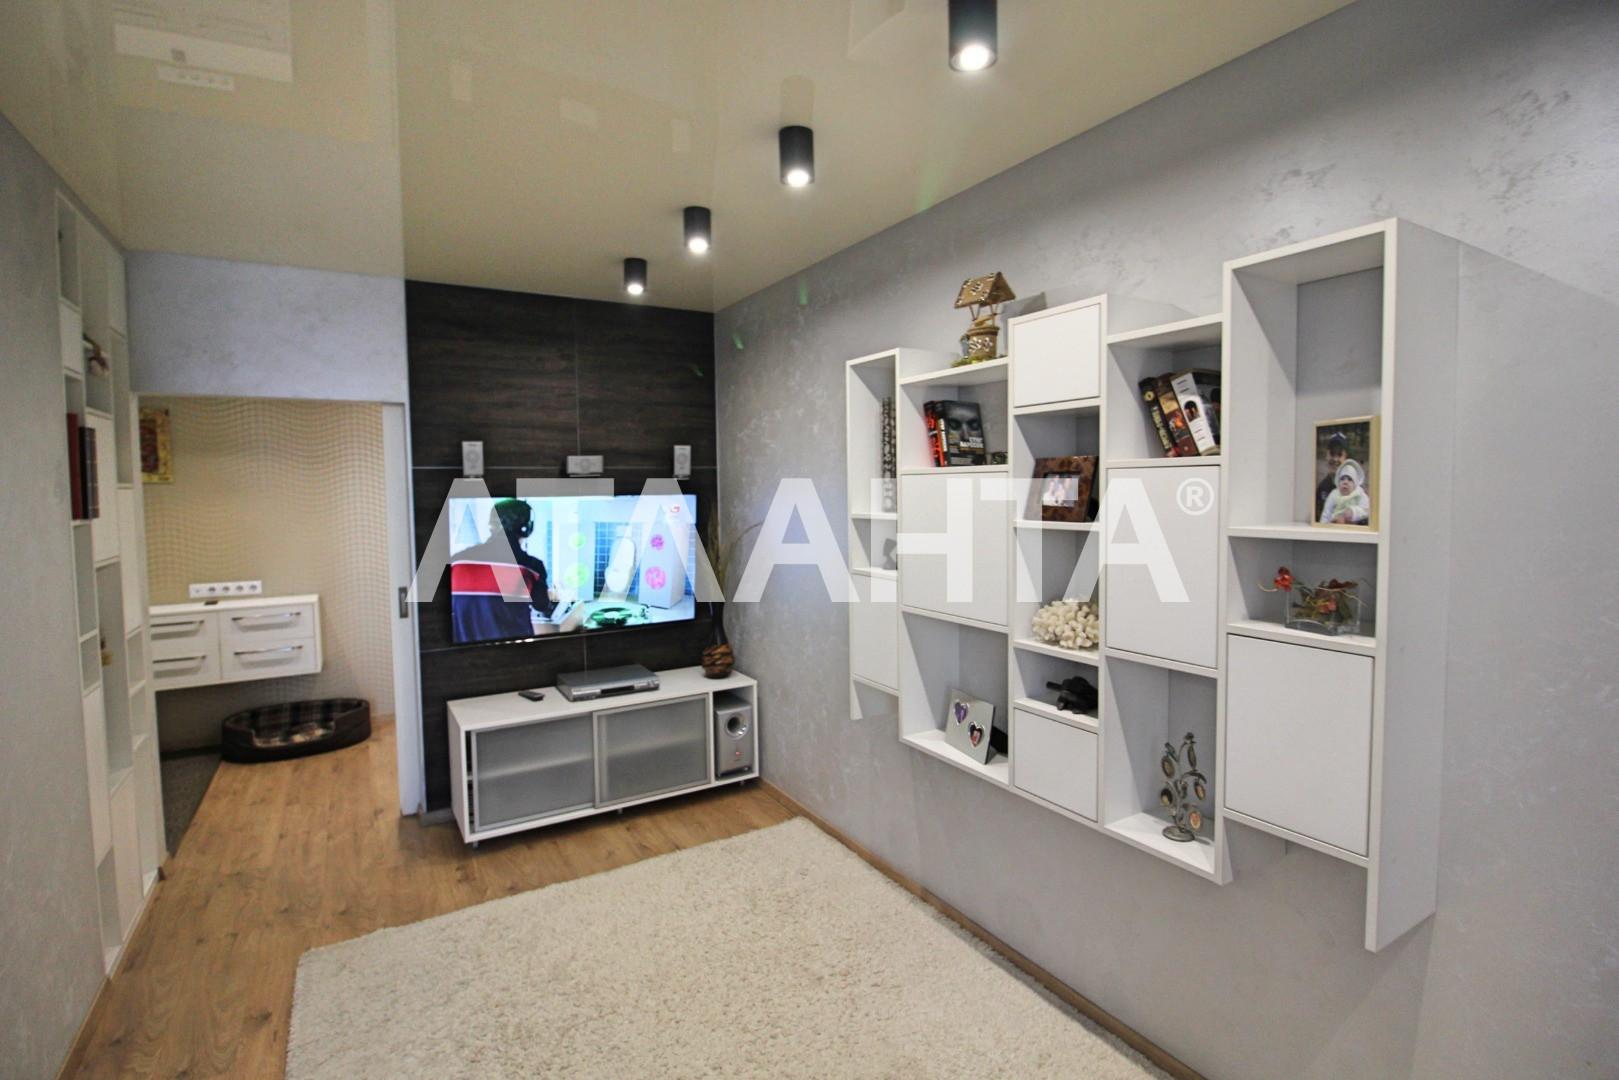 Продается 4-комнатная Квартира на ул. Ул. Богатырская — 175 000 у.е. (фото №4)